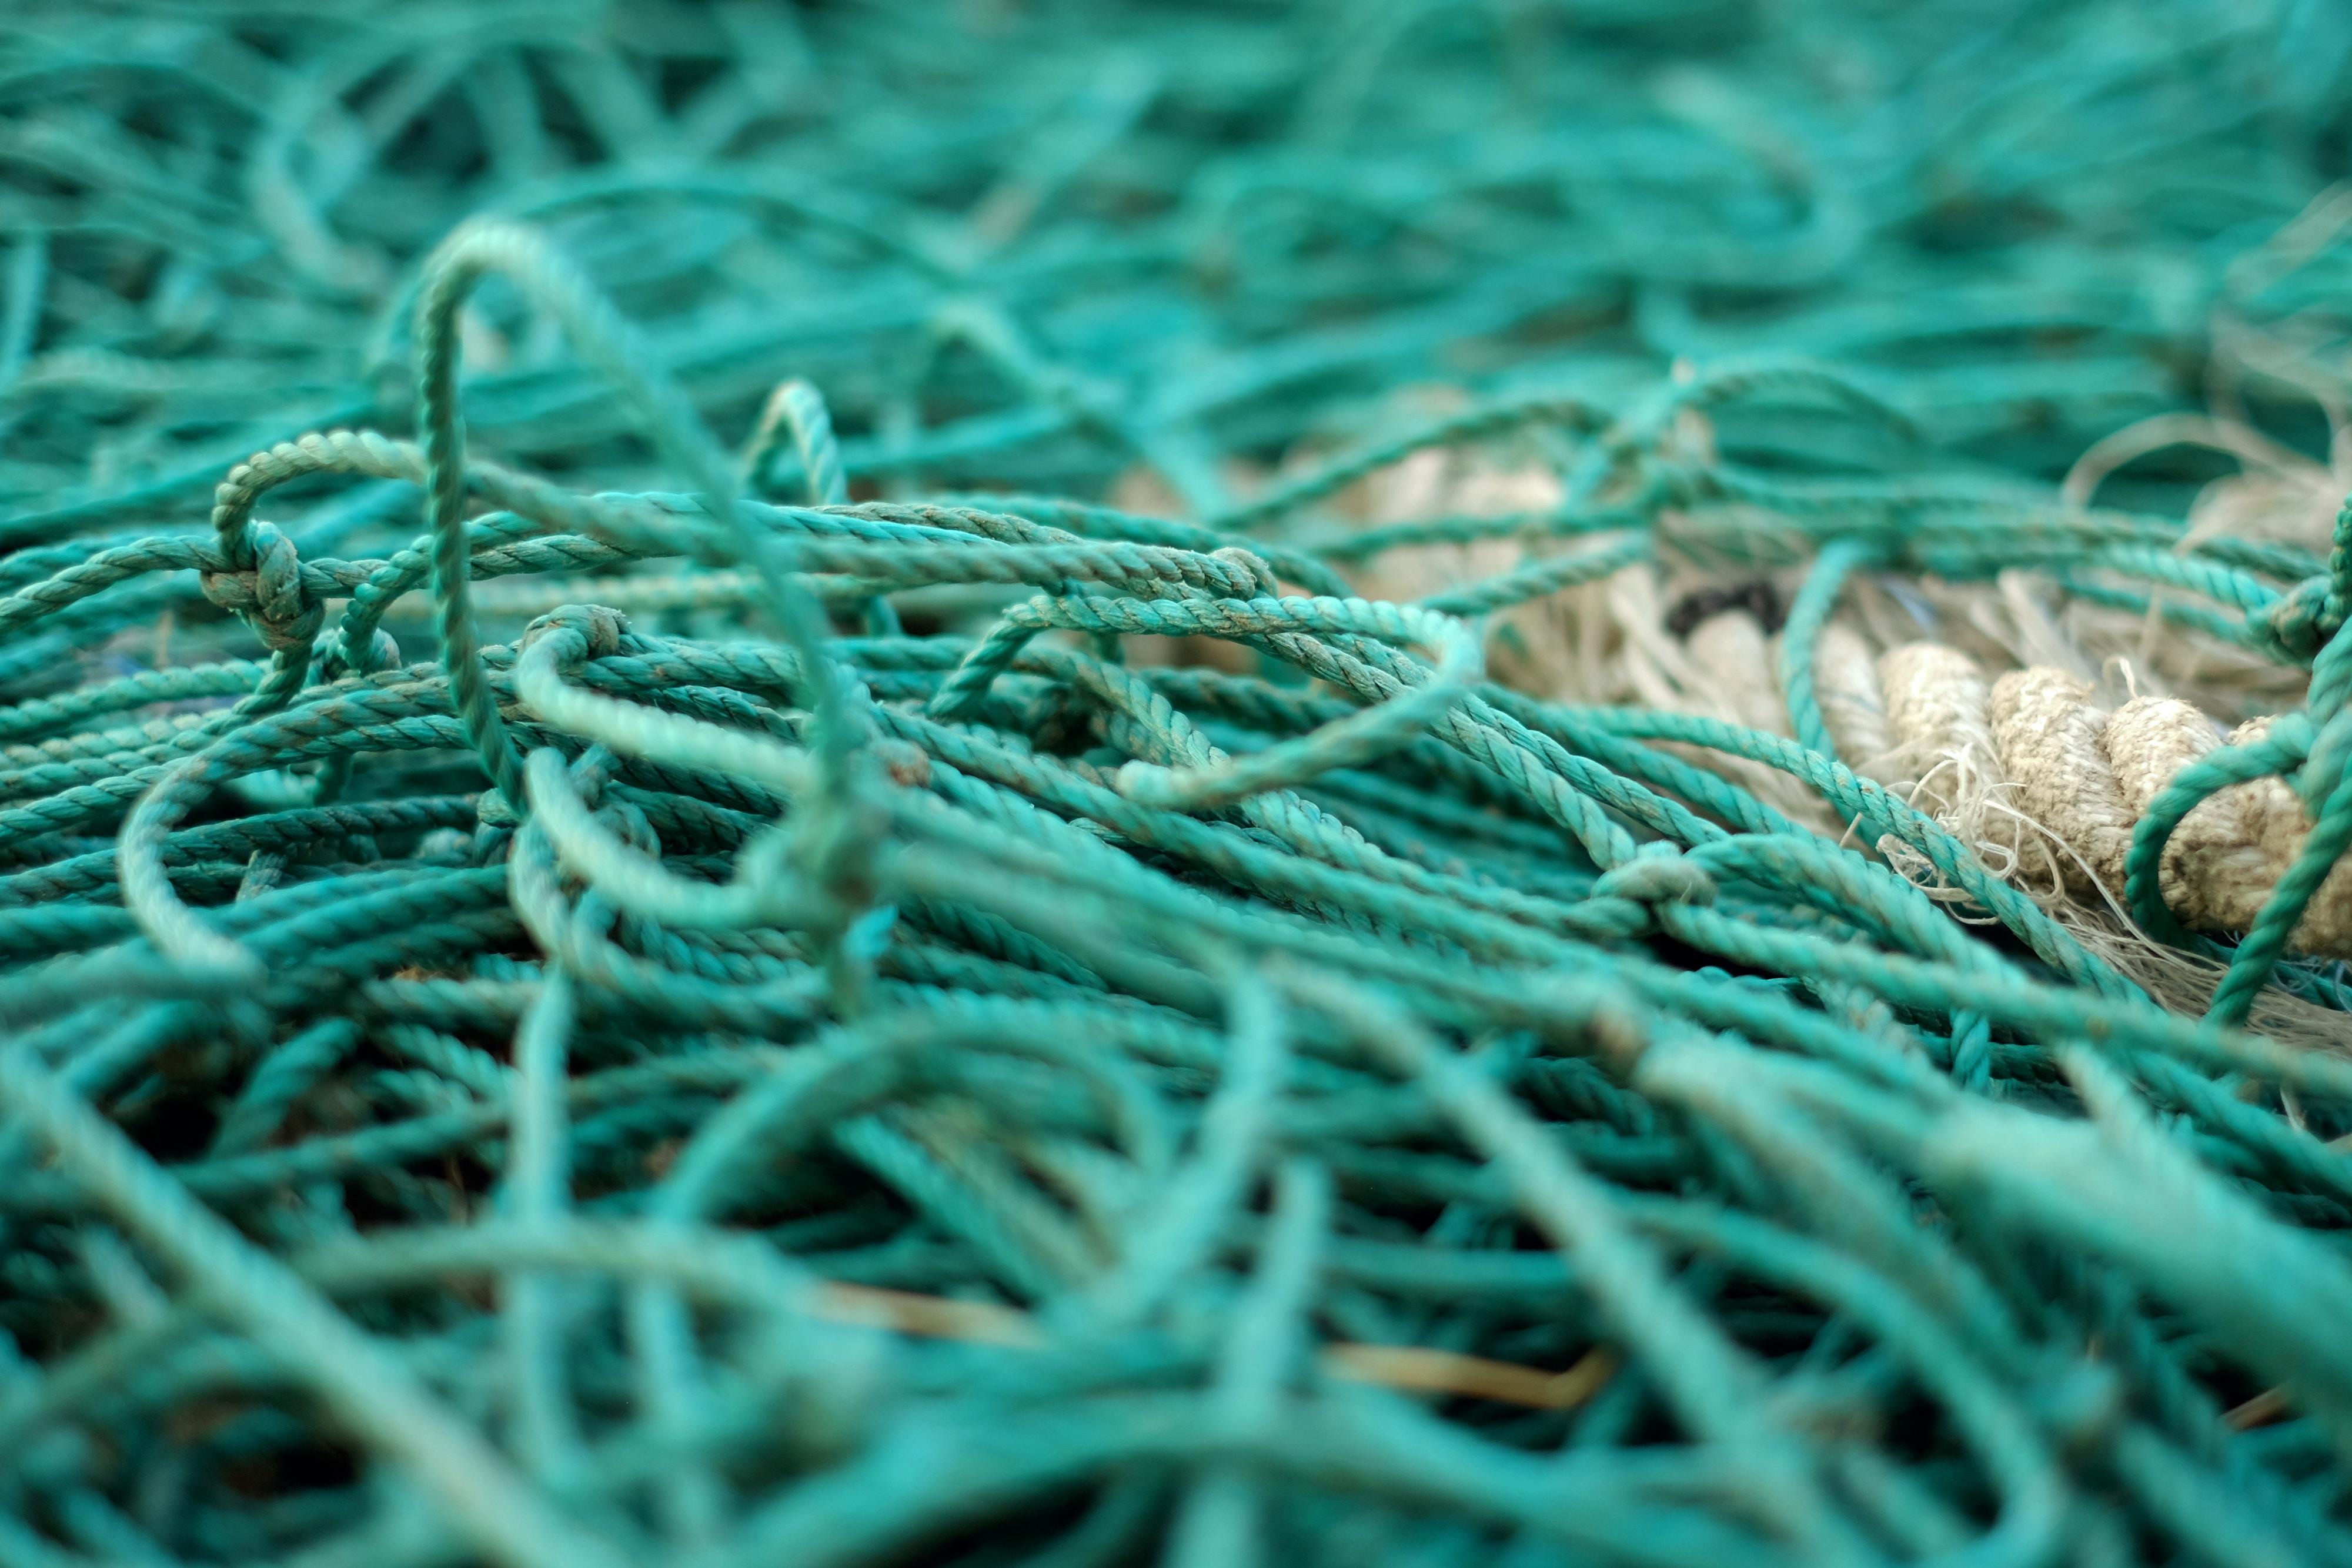 tilt shift photography of green ropes